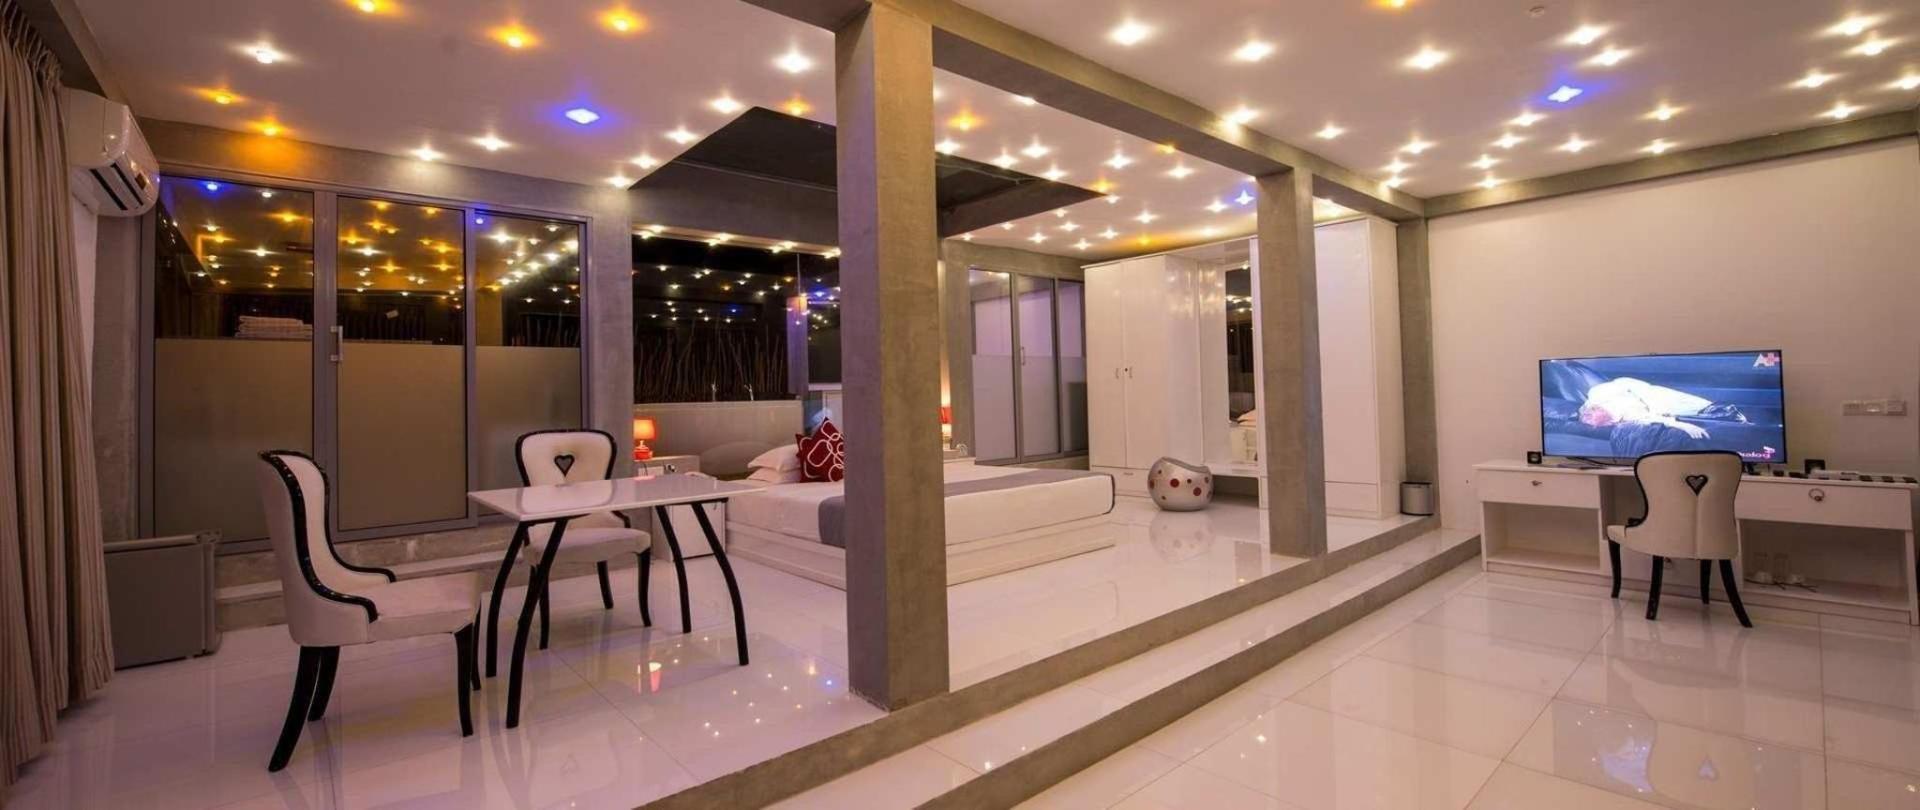 penthouse-1-jpg.jpeg